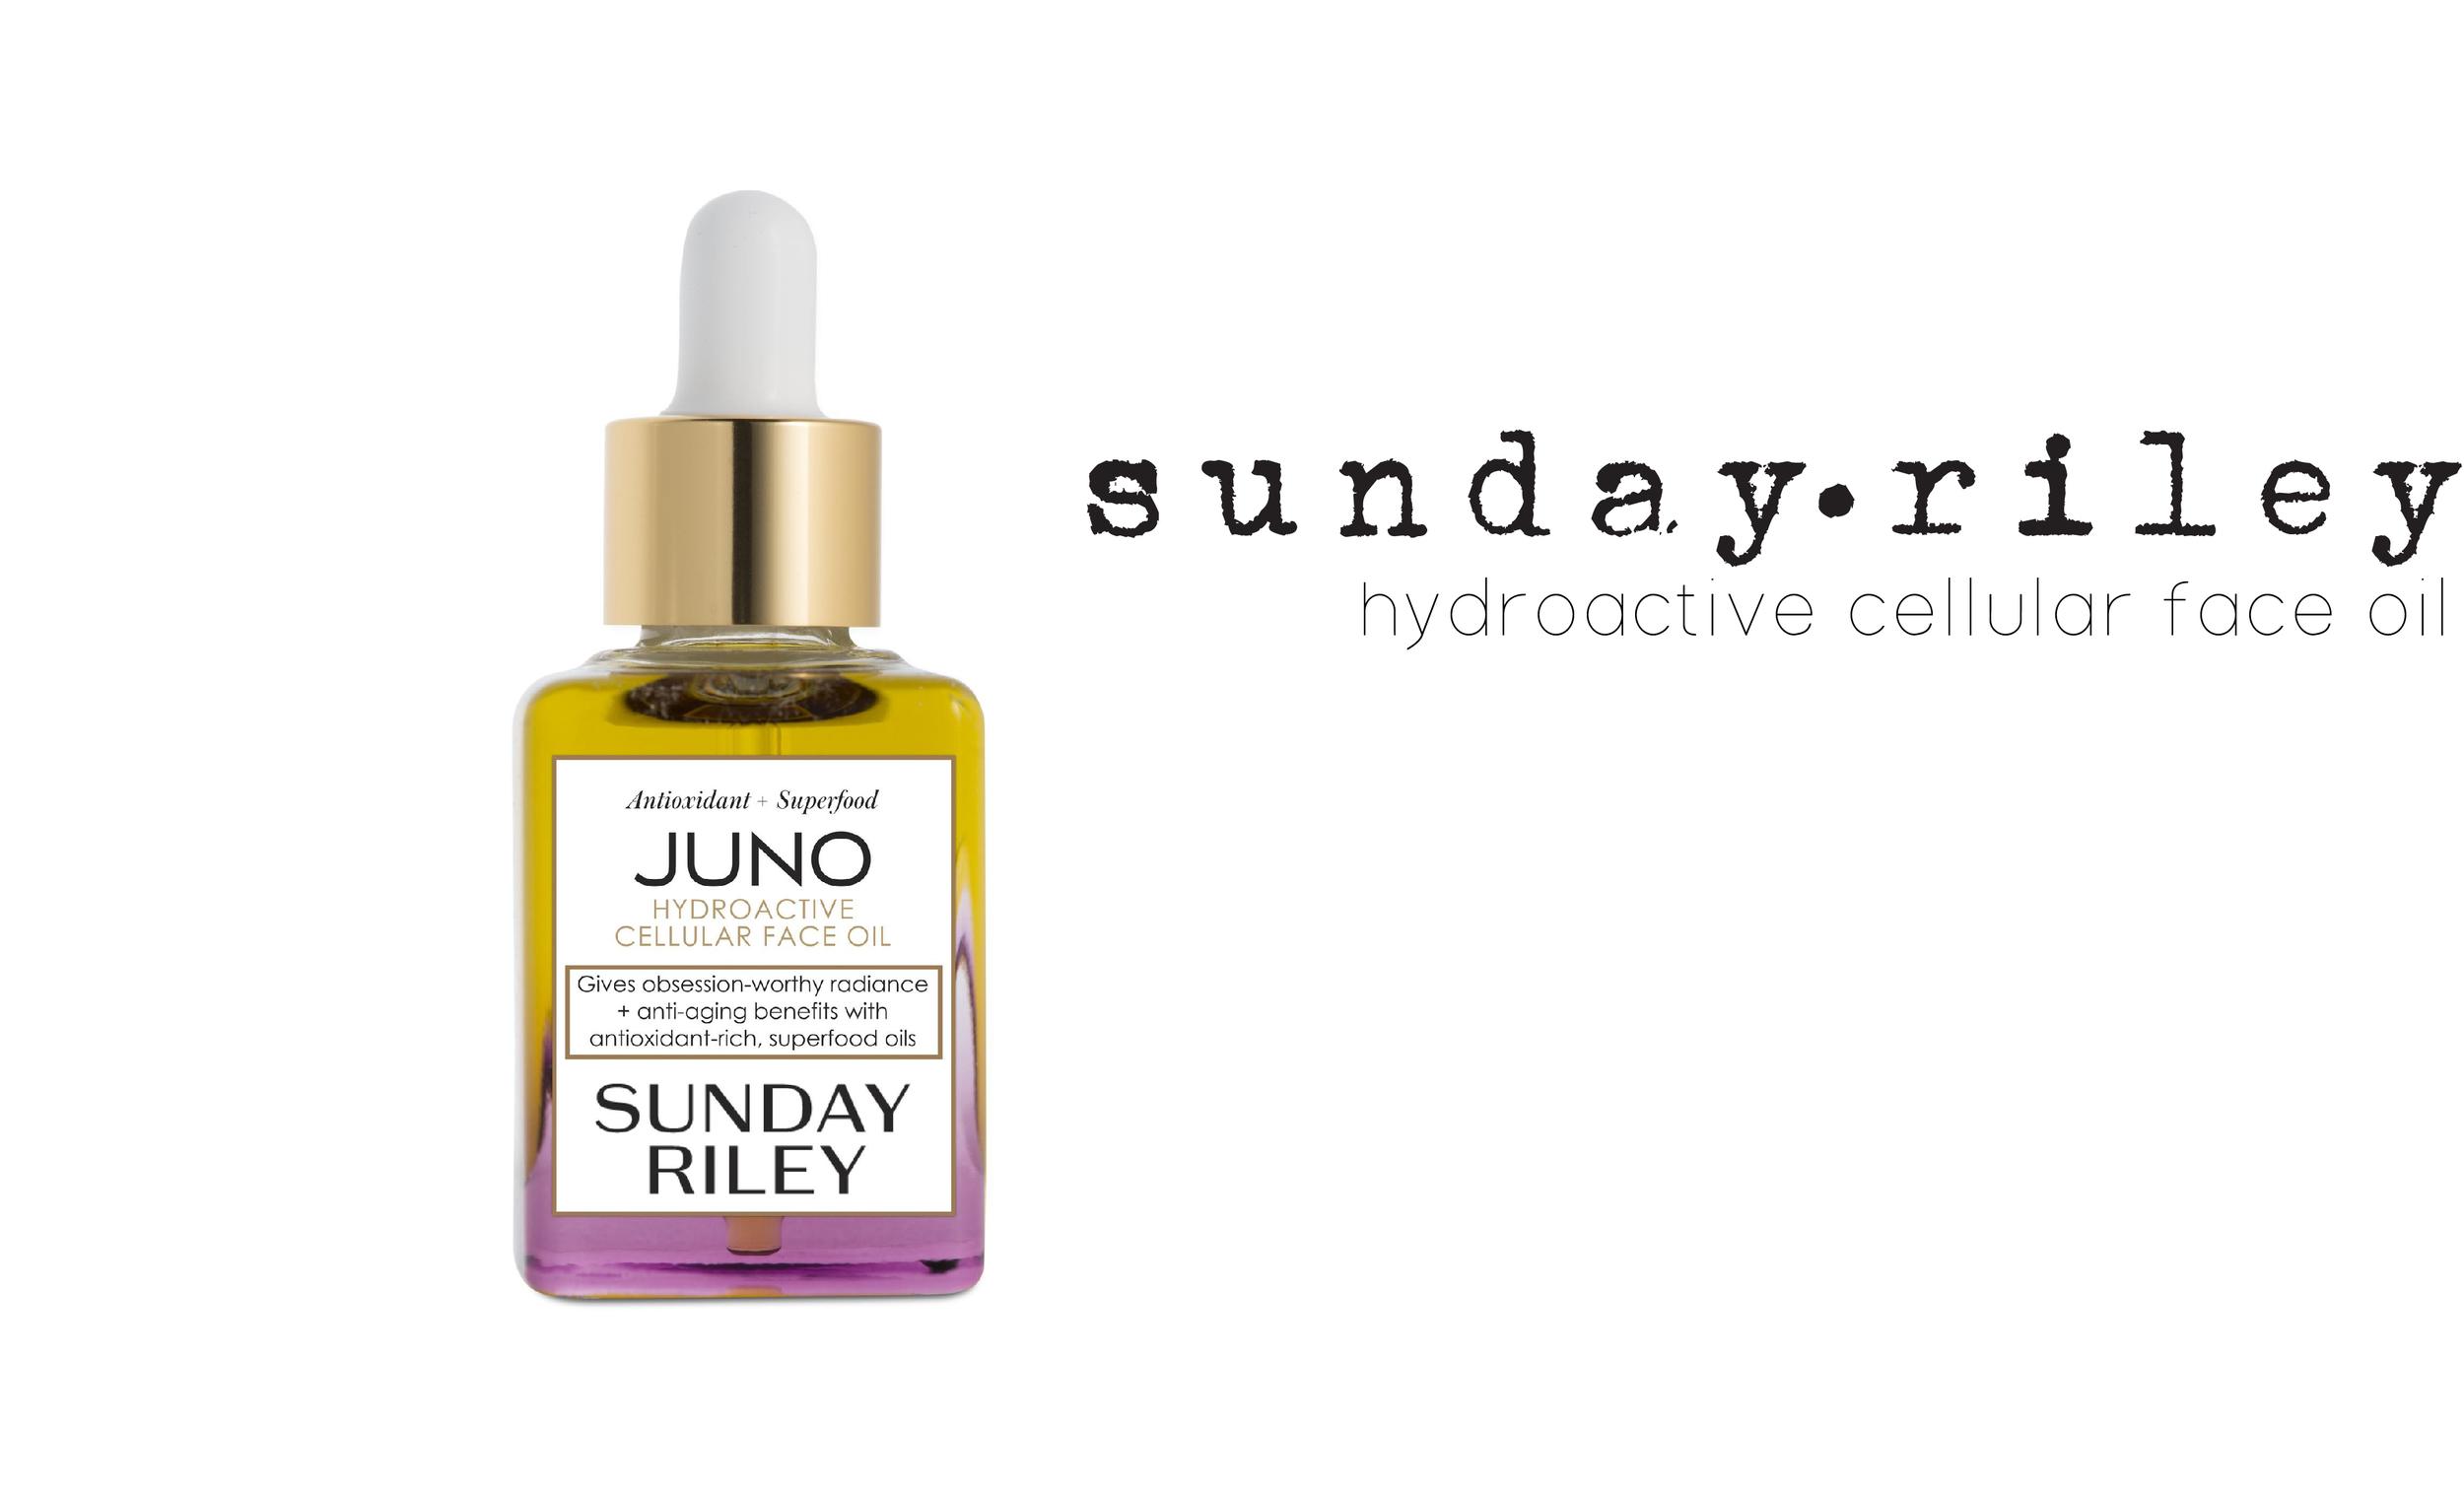 sundayriley_juno_homepage.jpg